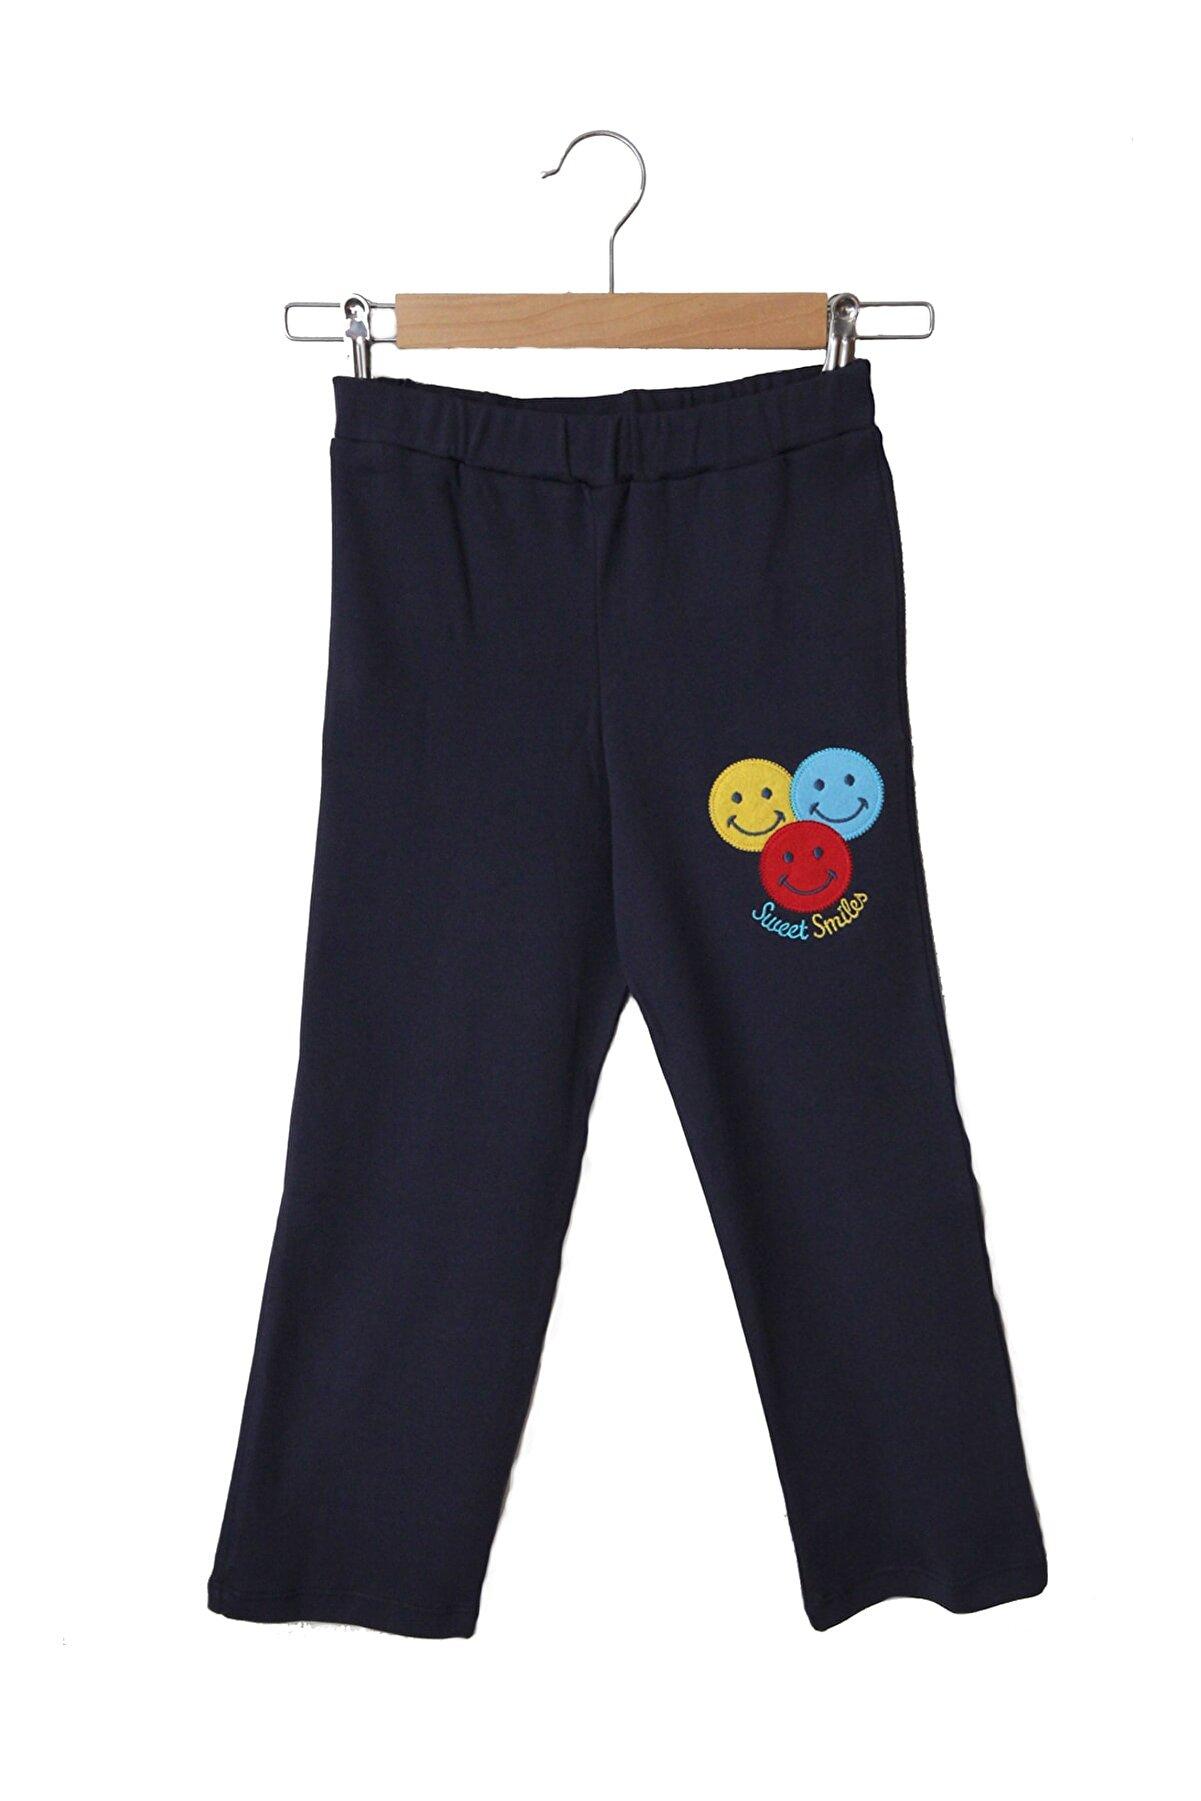 Pijama Denizi Unisex Çocuk Yüzde Yüz Pamuk Eşofman Pijama Altı